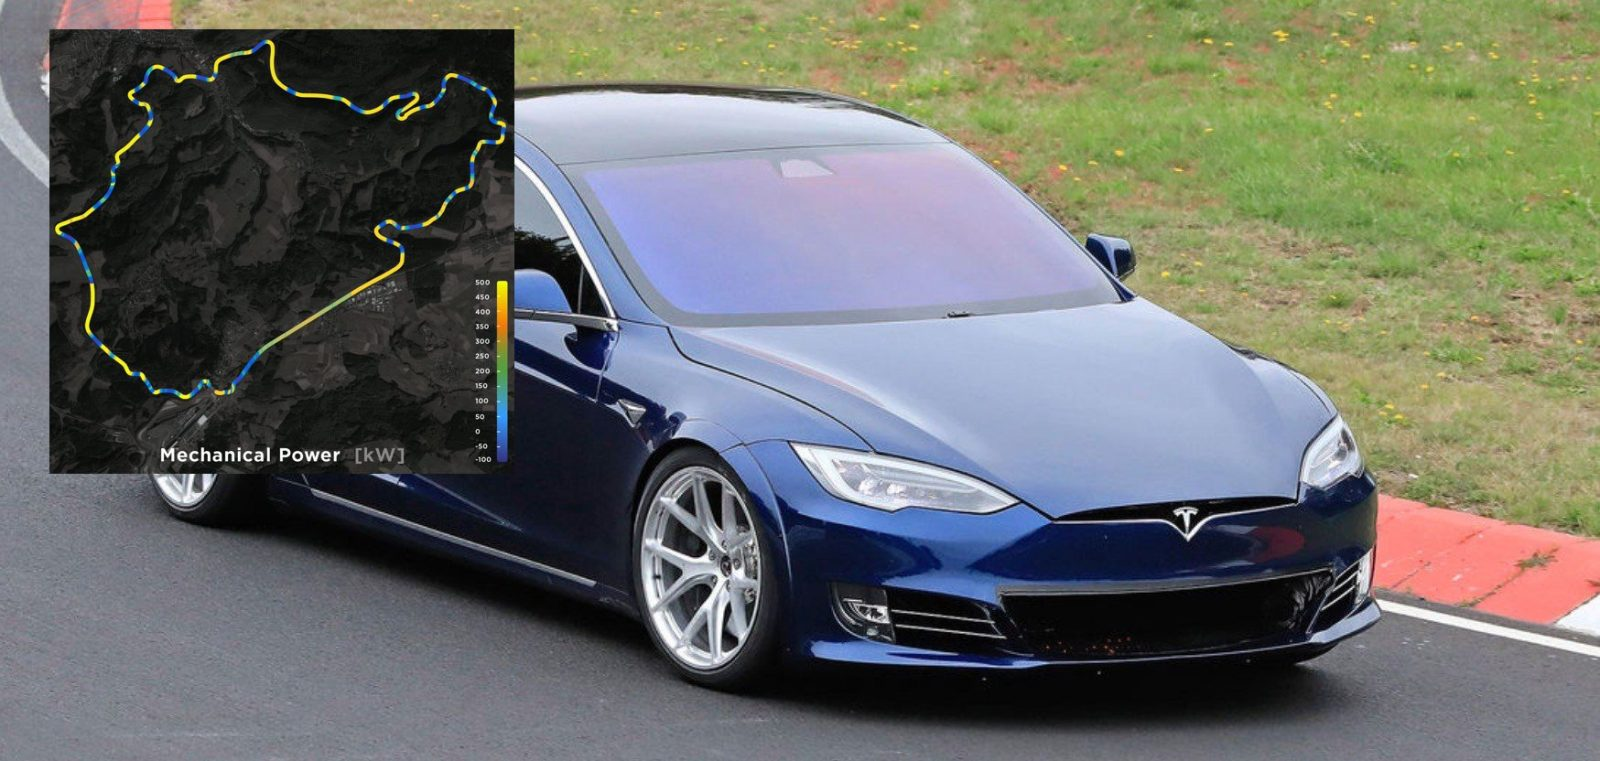 Tesla Model S Plaid pokrenuo debatu u vezi s rekordima kruga na Nirburgringu